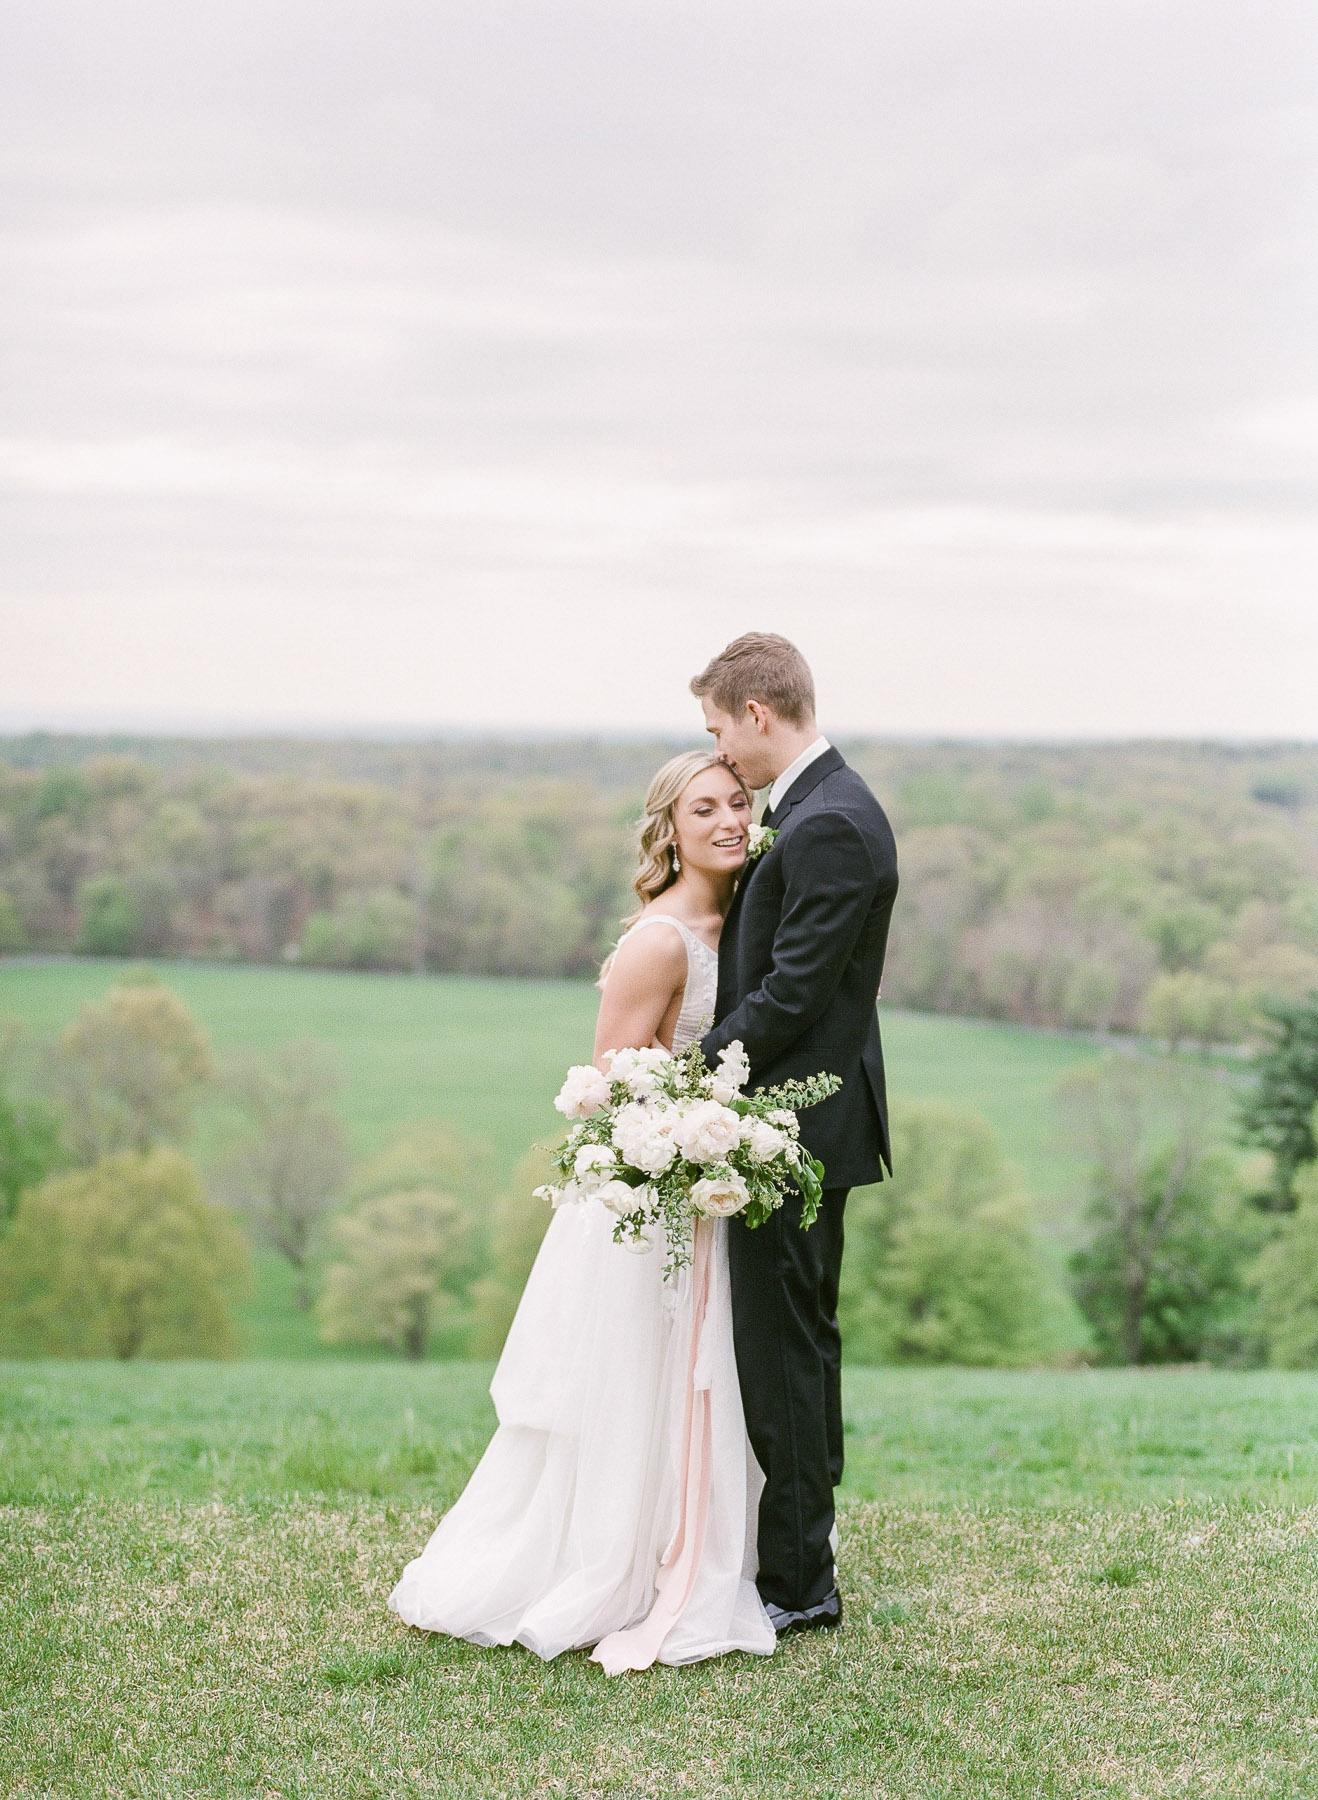 Hilltop wedding in NJ